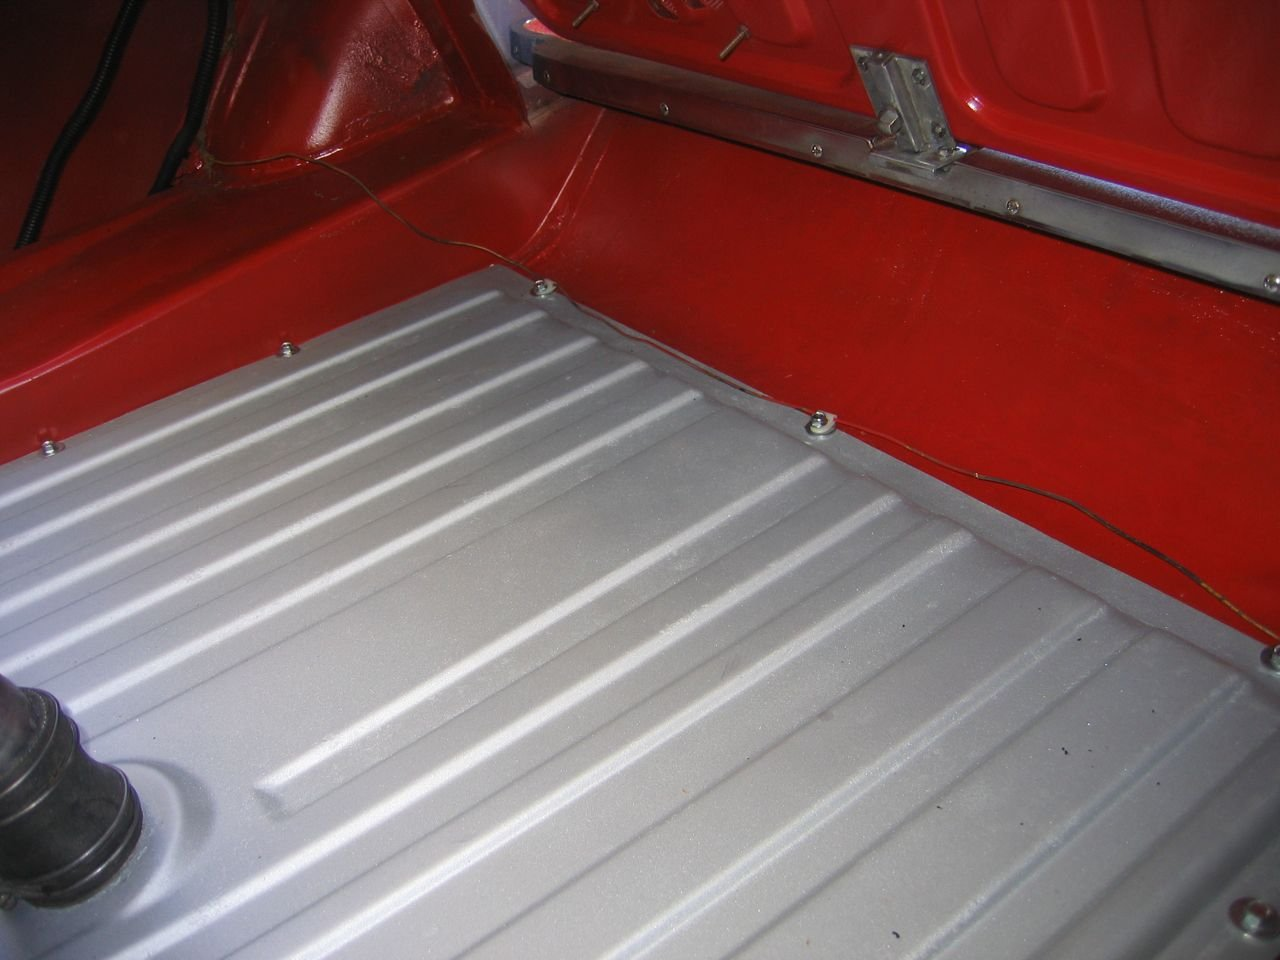 66 Mustang Fuel Sending Unit Wiring Trusted Diagrams 1966 Corvette Diagram Schematic Wire Data Schema U2022 Pump